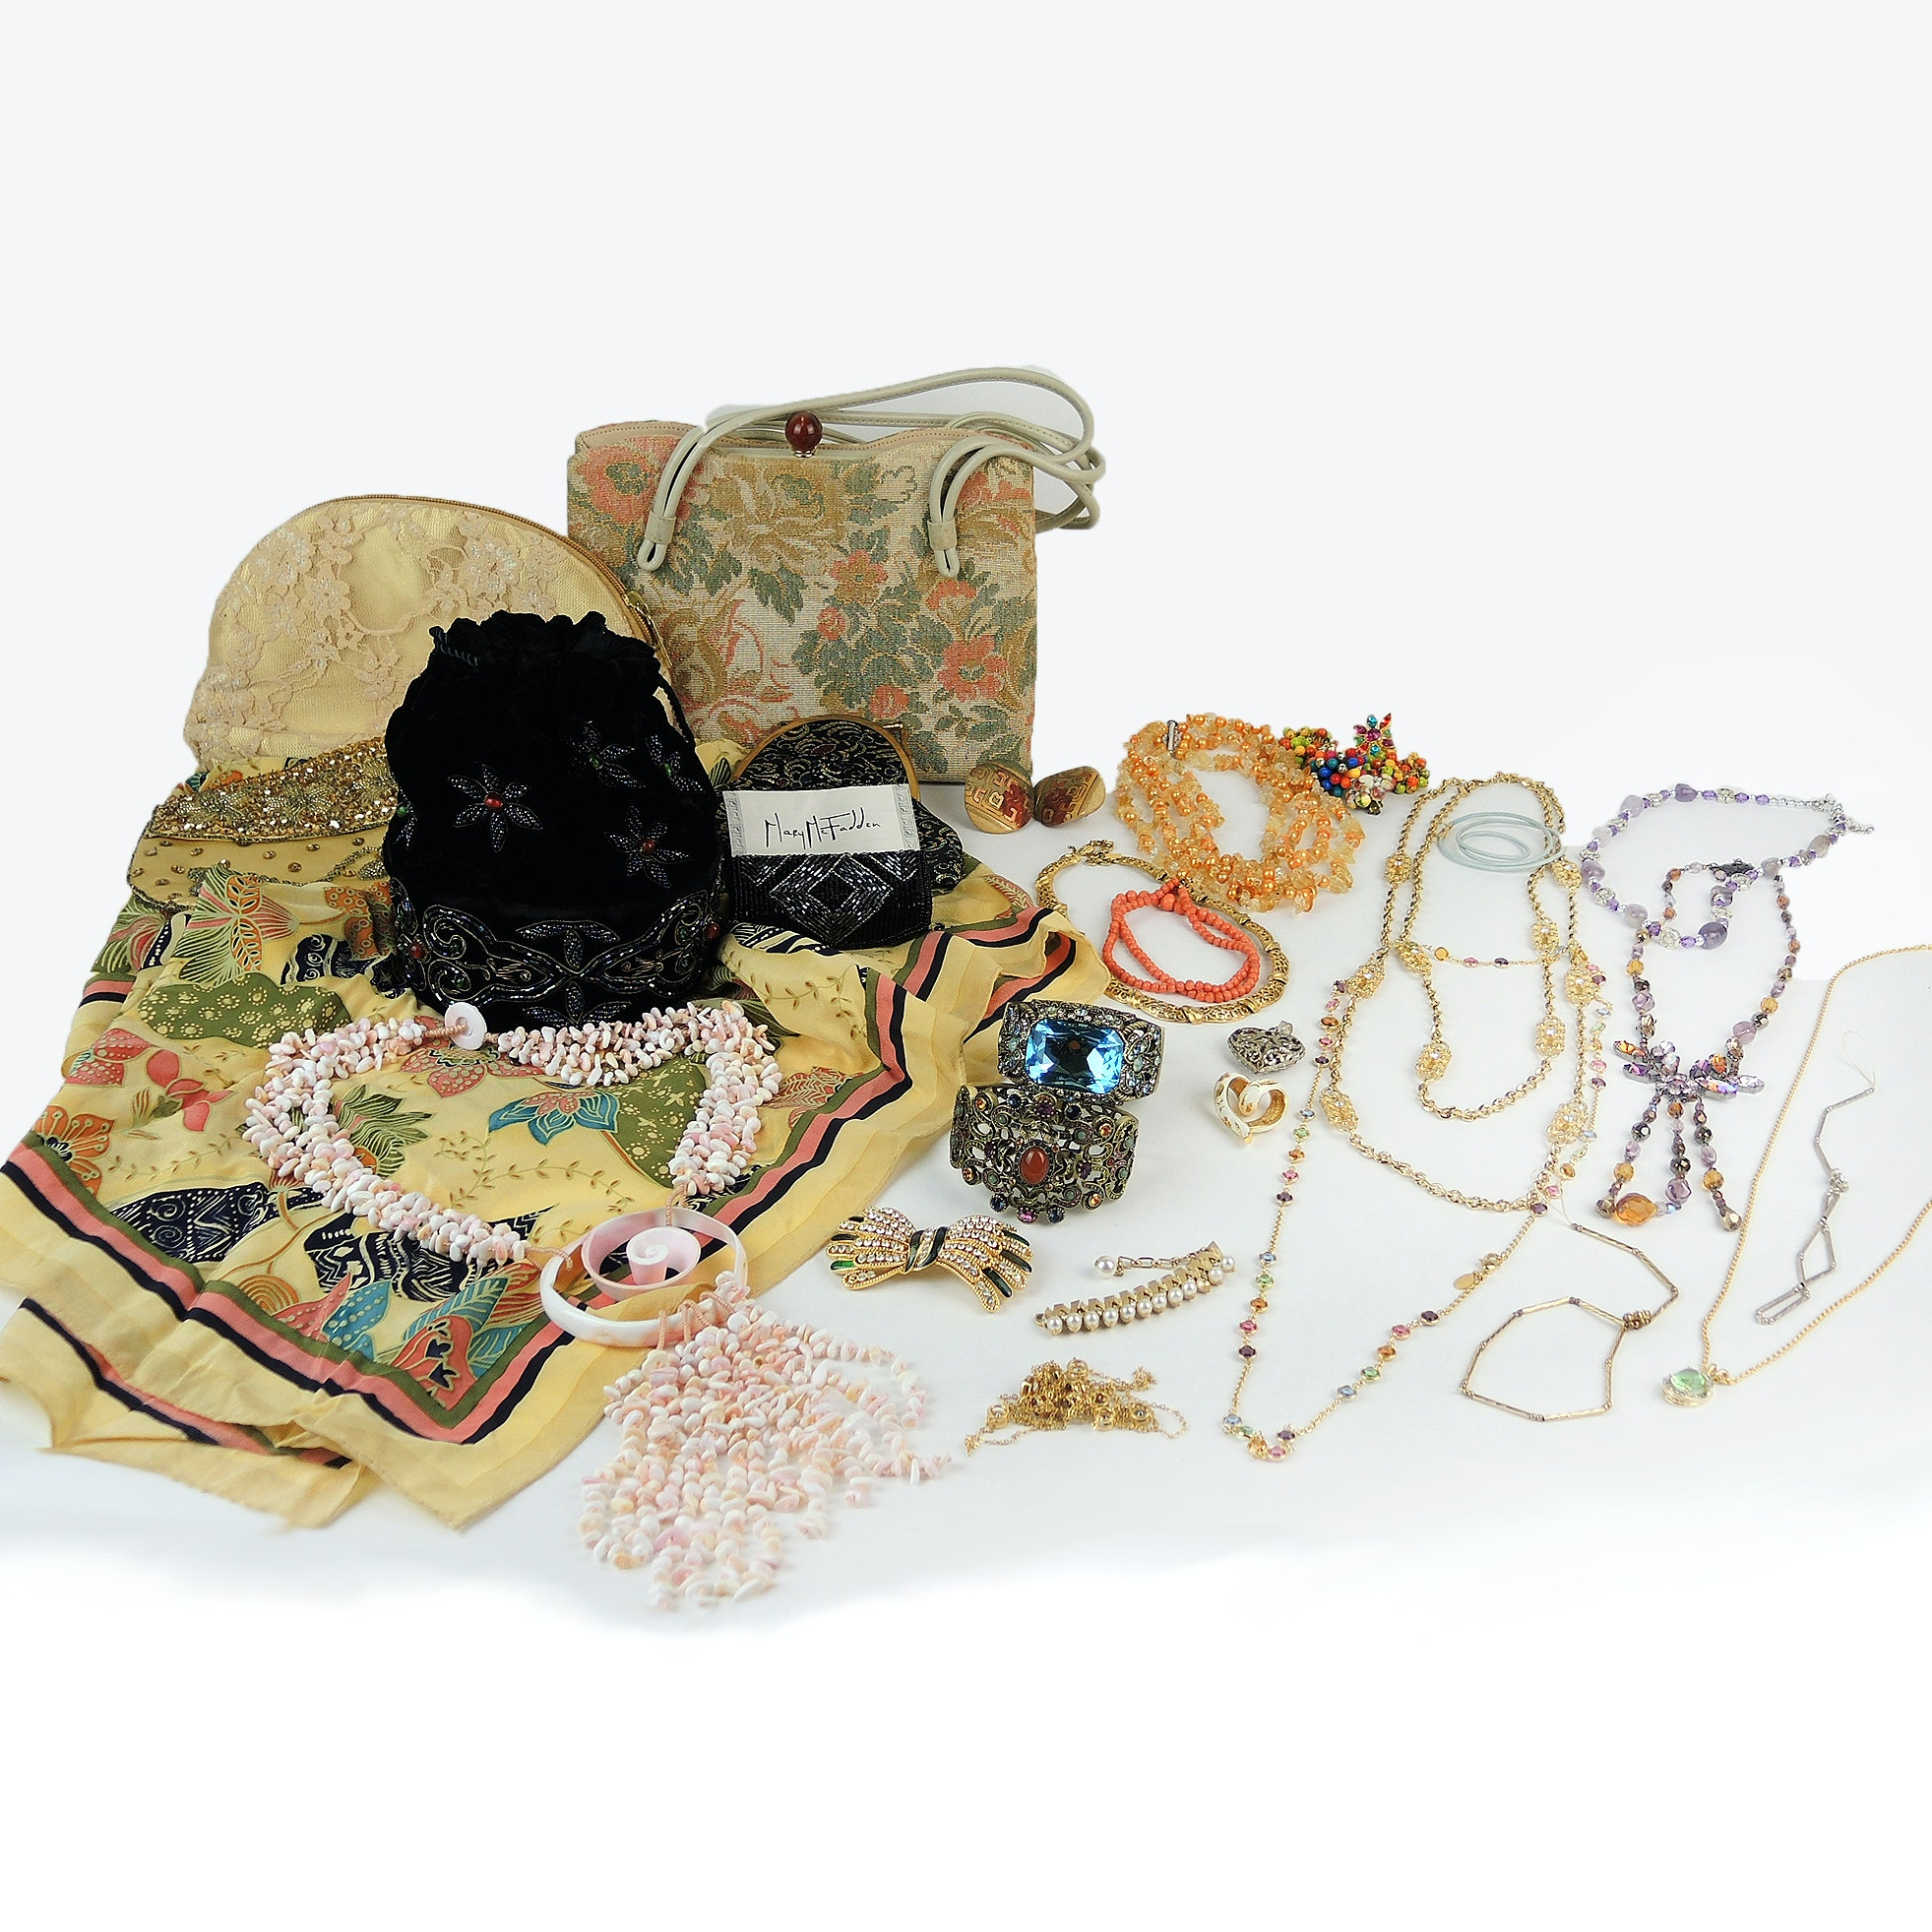 Costume Jewelry and Handbags Featuring Designers Heidi Daus and Mary McFadden